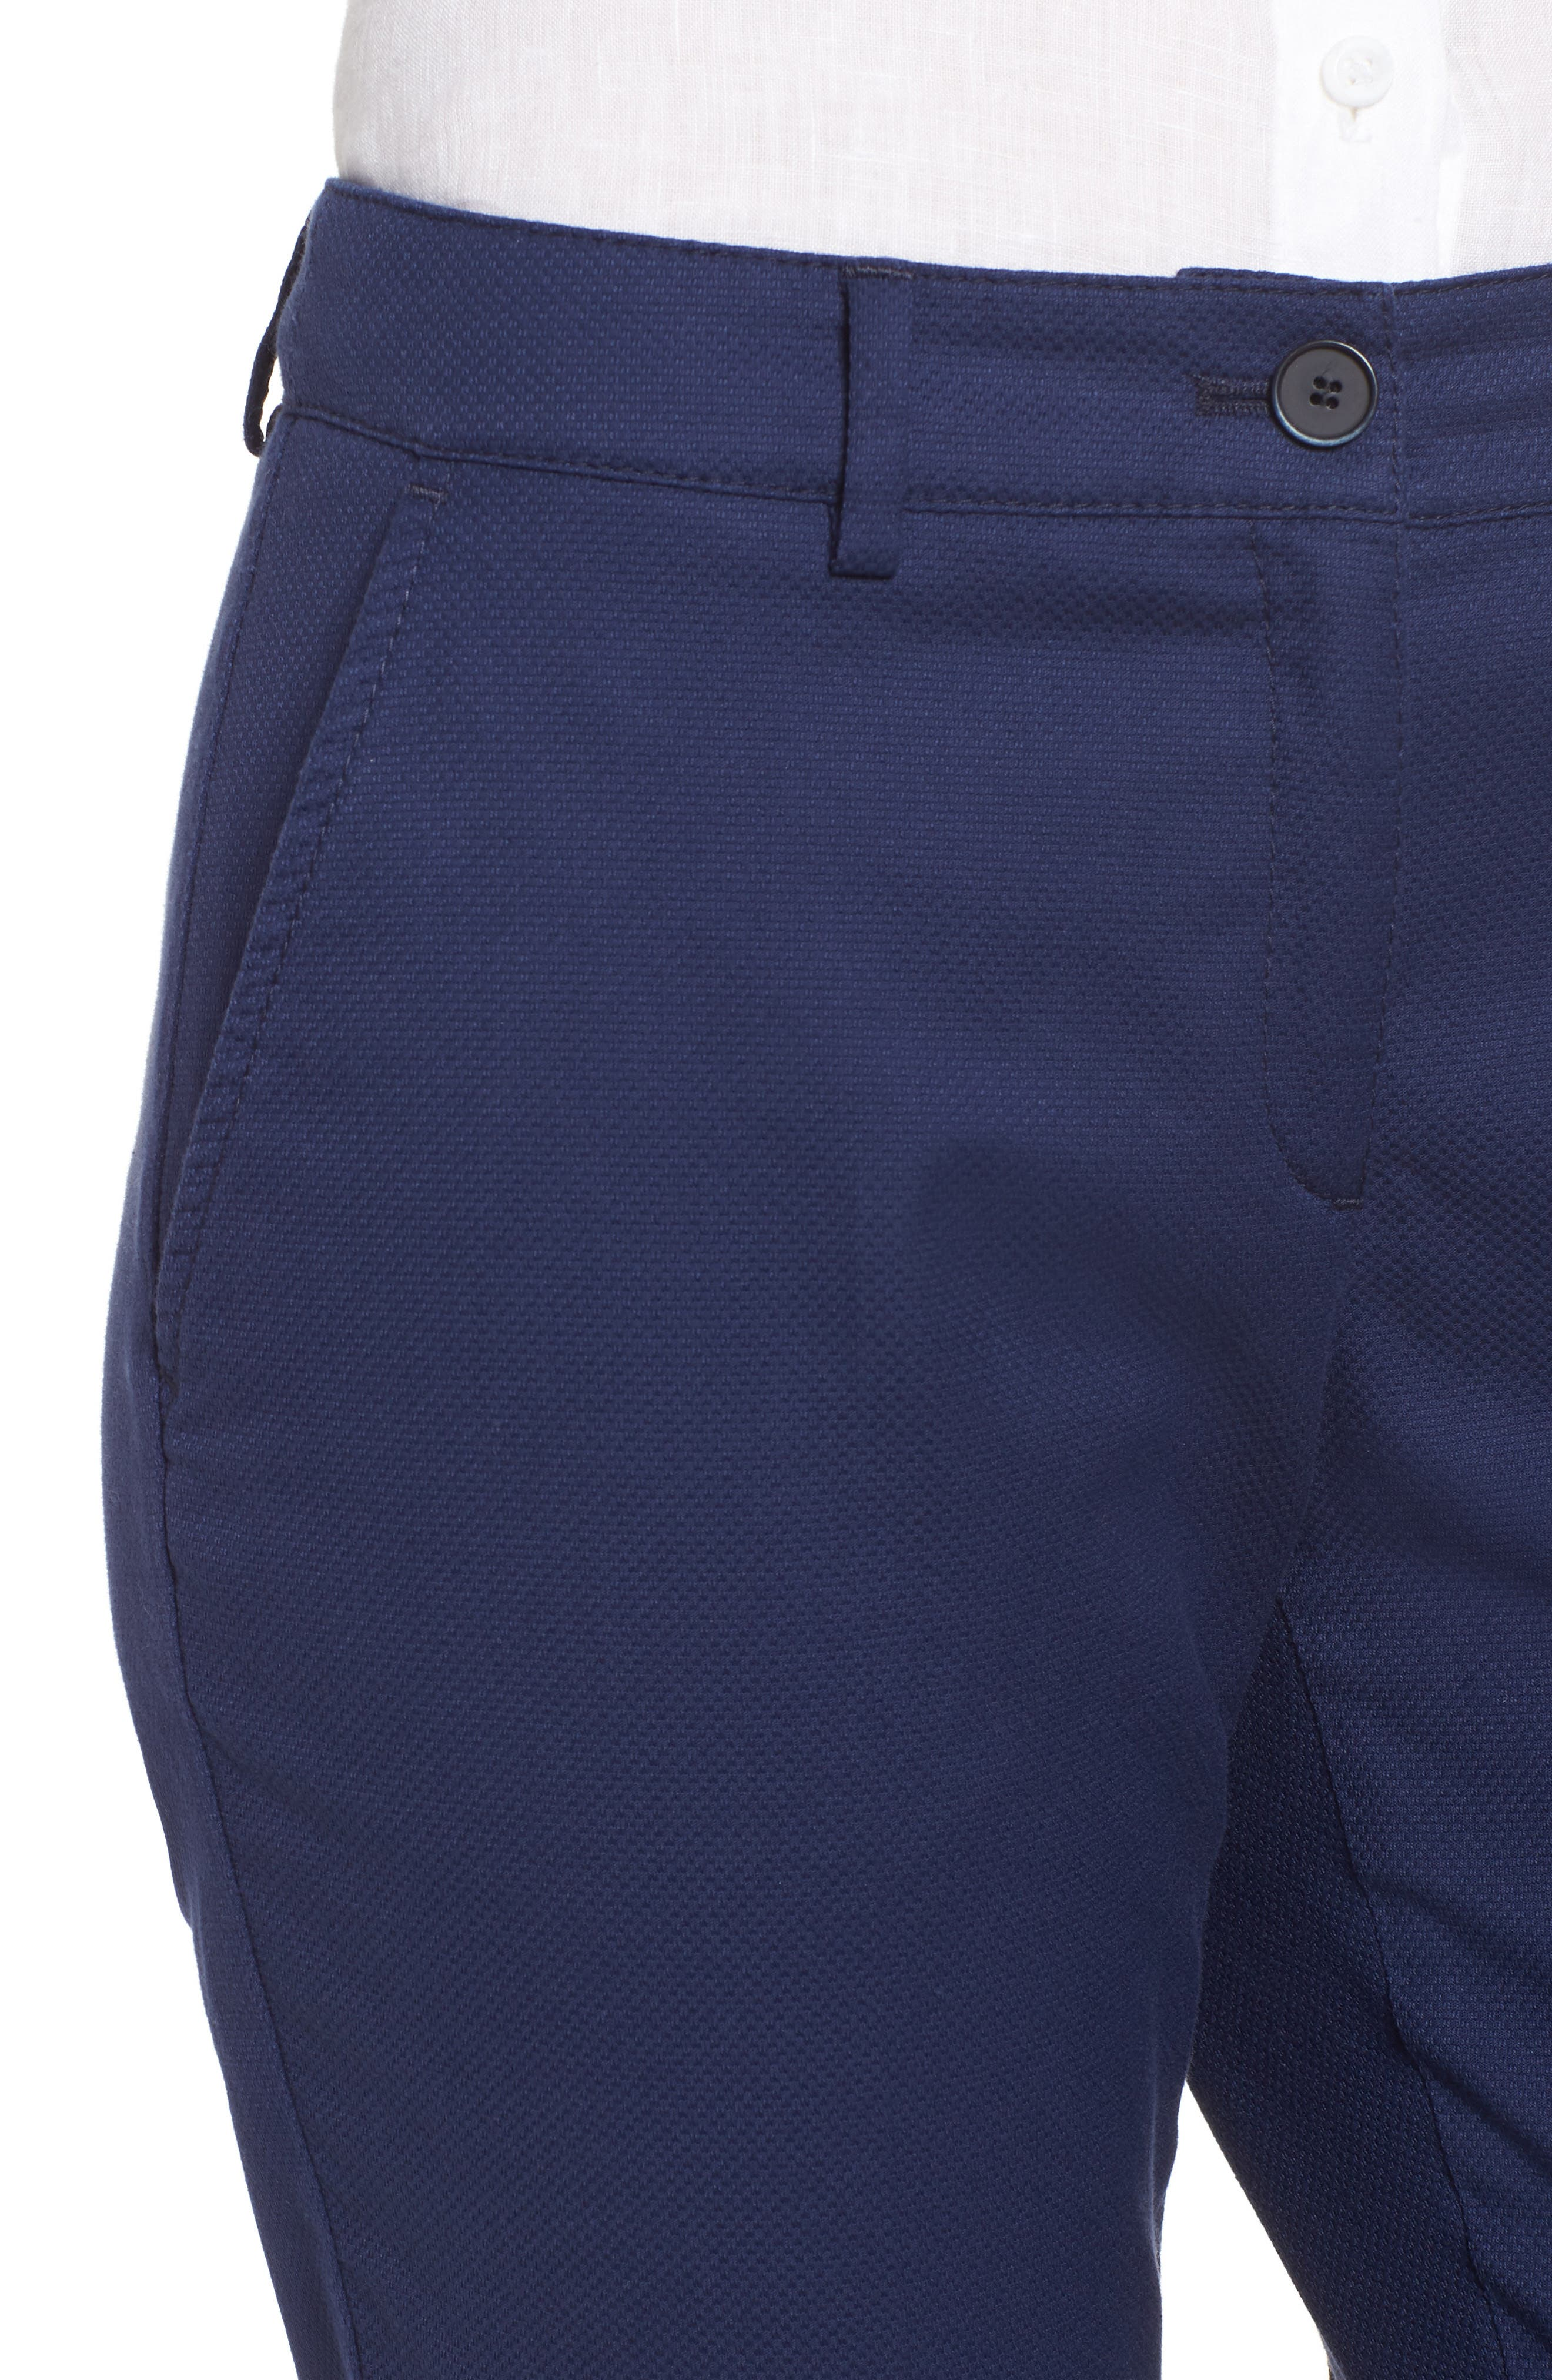 Maron Cuffed Straight Leg Pants,                             Alternate thumbnail 4, color,                             422